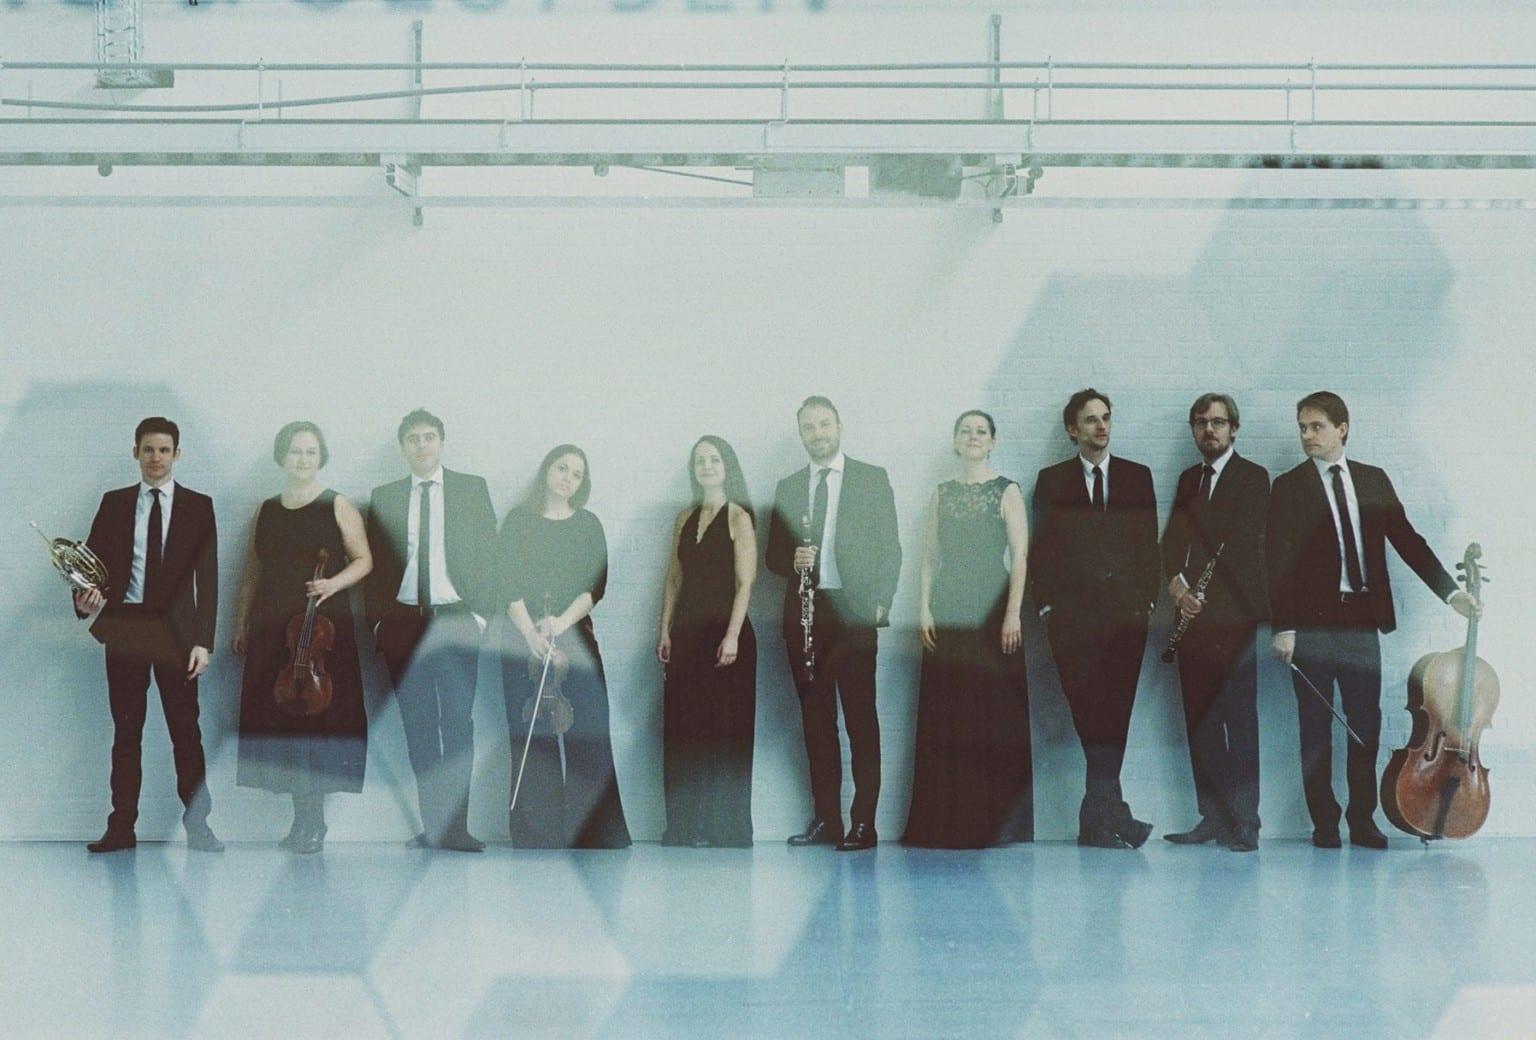 Koncert med Ensemble MidtVest på Klosterlund Museum Improvisation